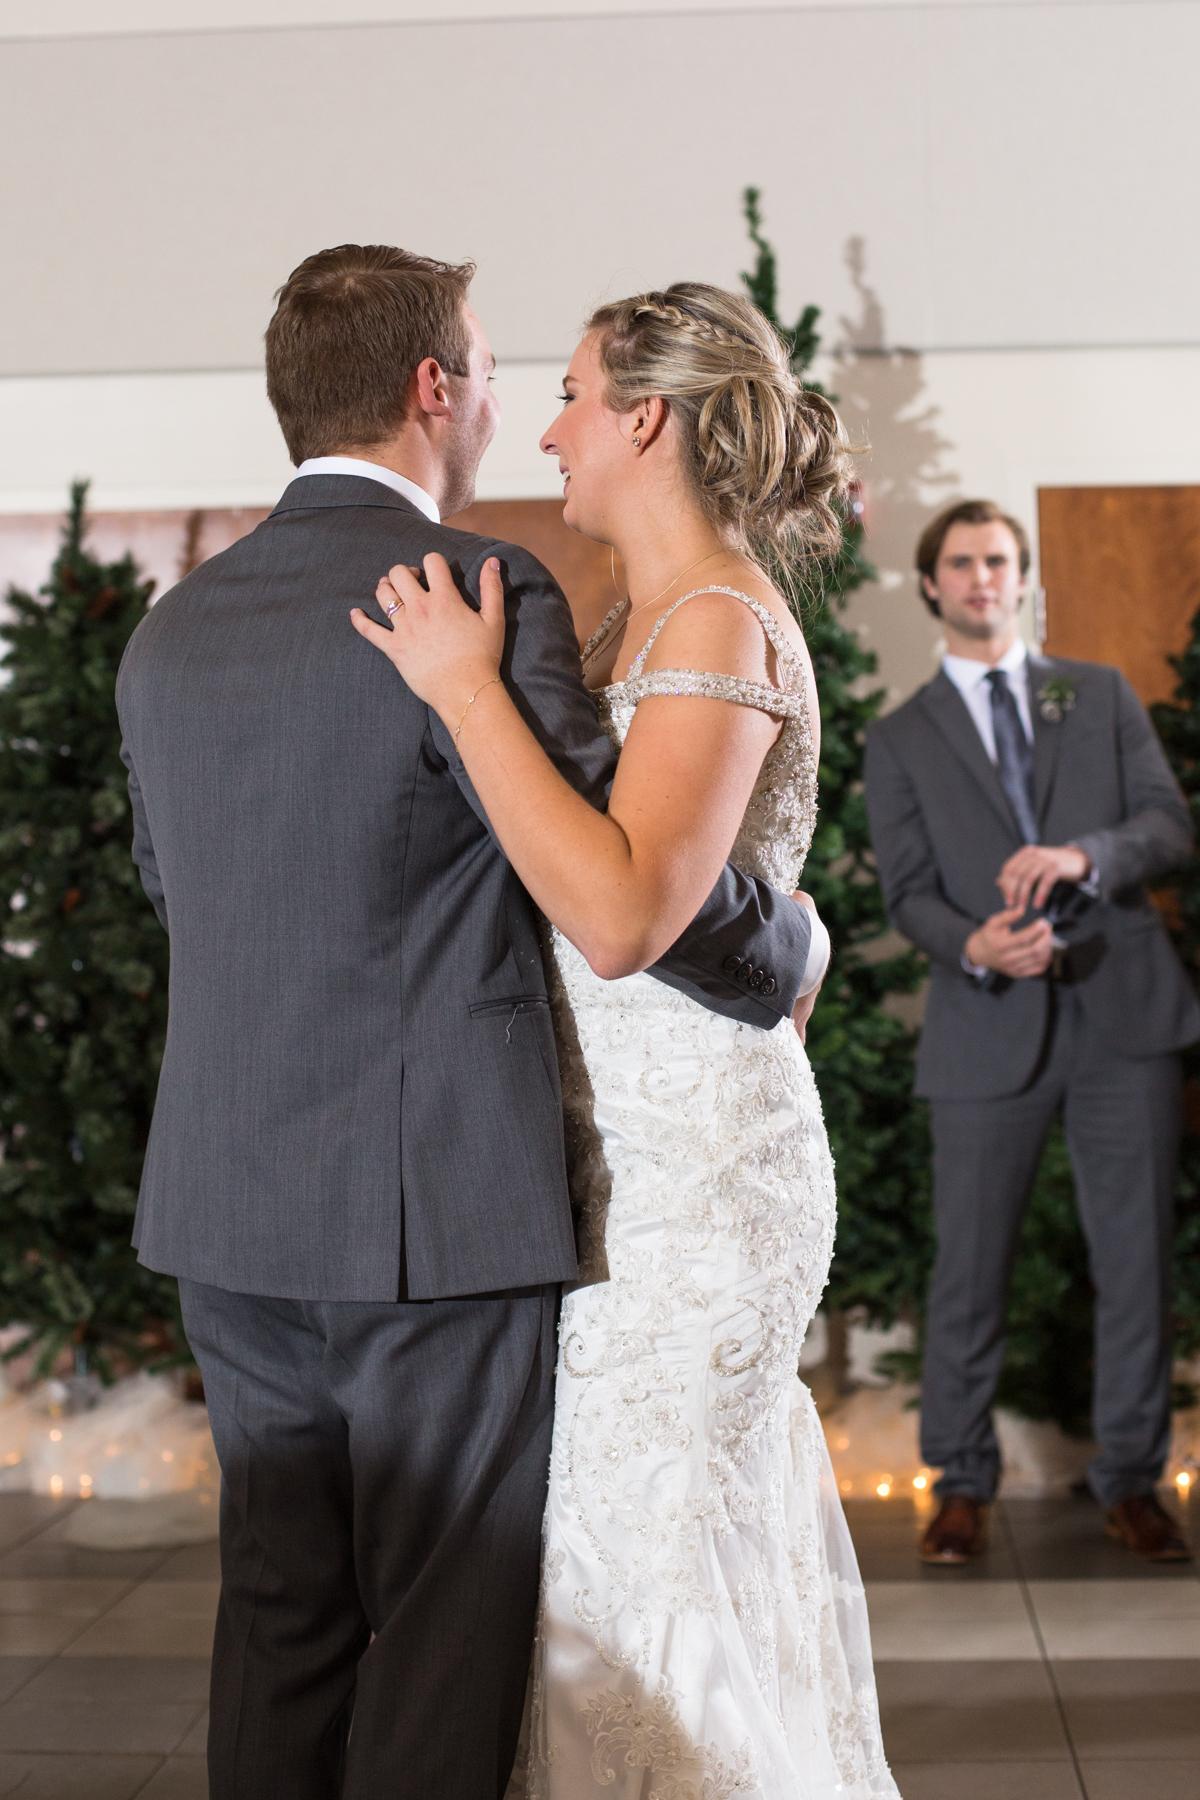 Kelli-and-Matt-Nashville-Wedding-Sneak-Peak-0274.jpg